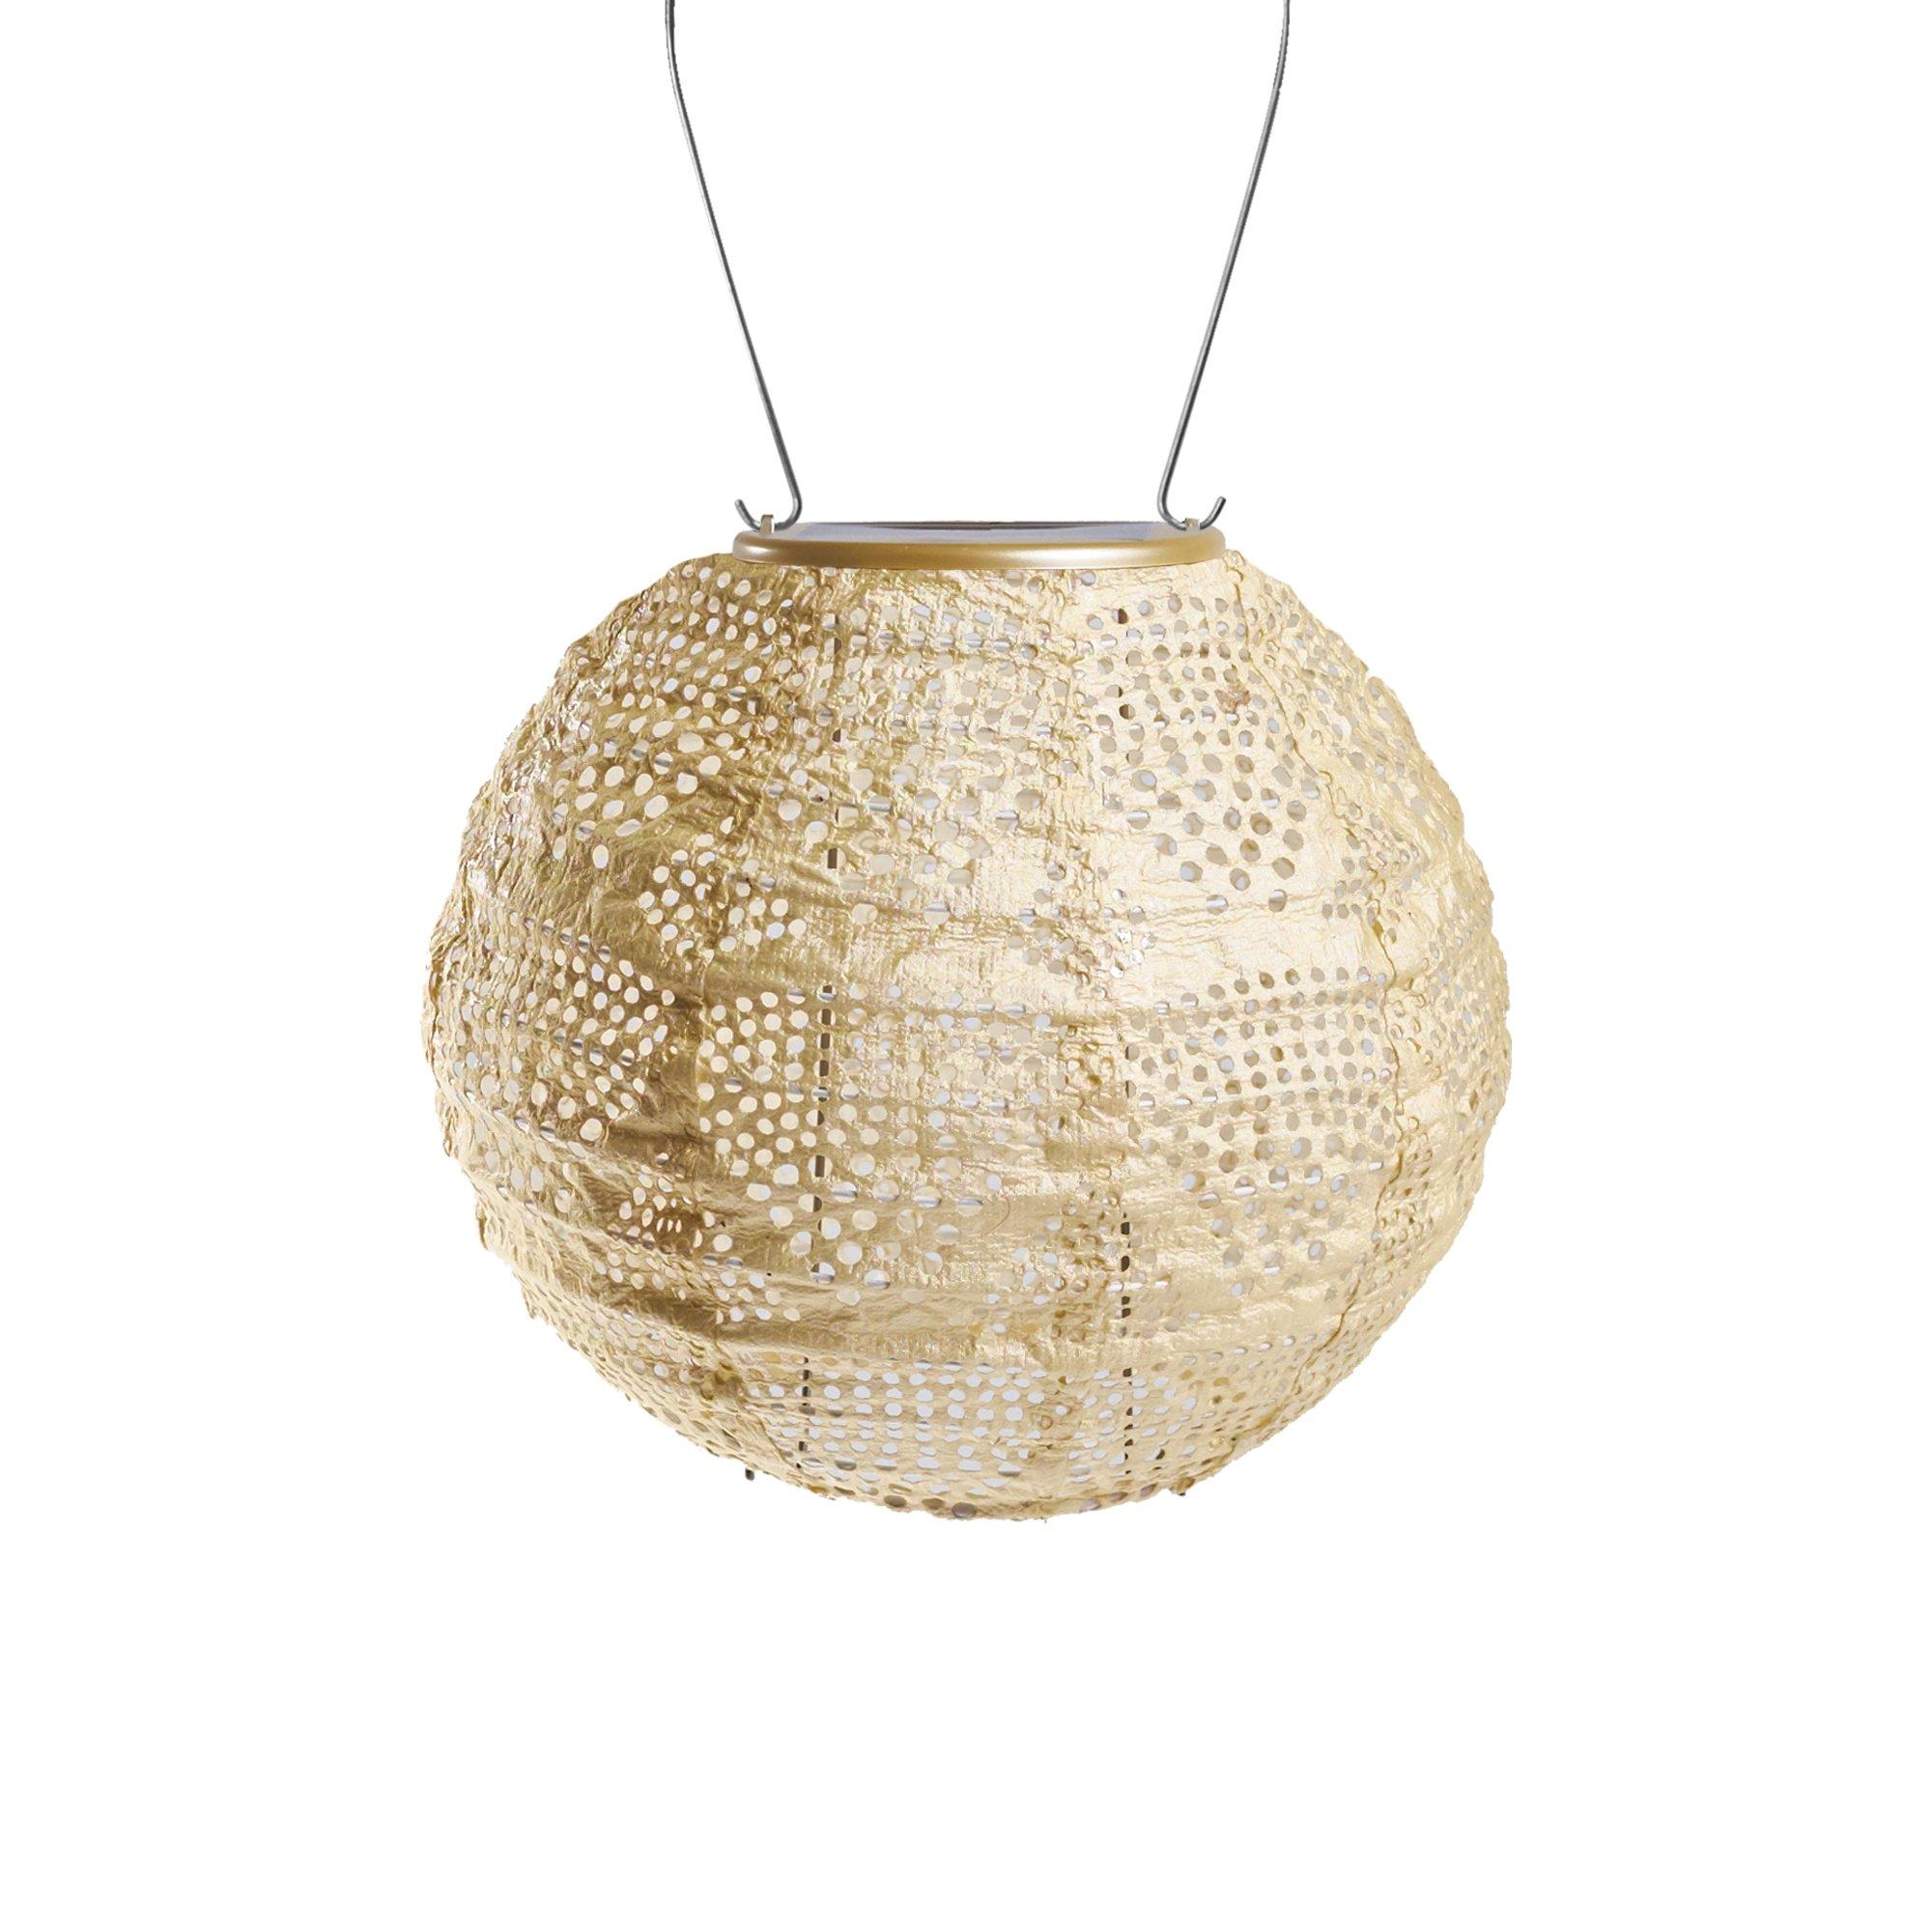 Allsop Home & Garden 31771 Soji Stella Solar Lantern, Pearl Wave Globe